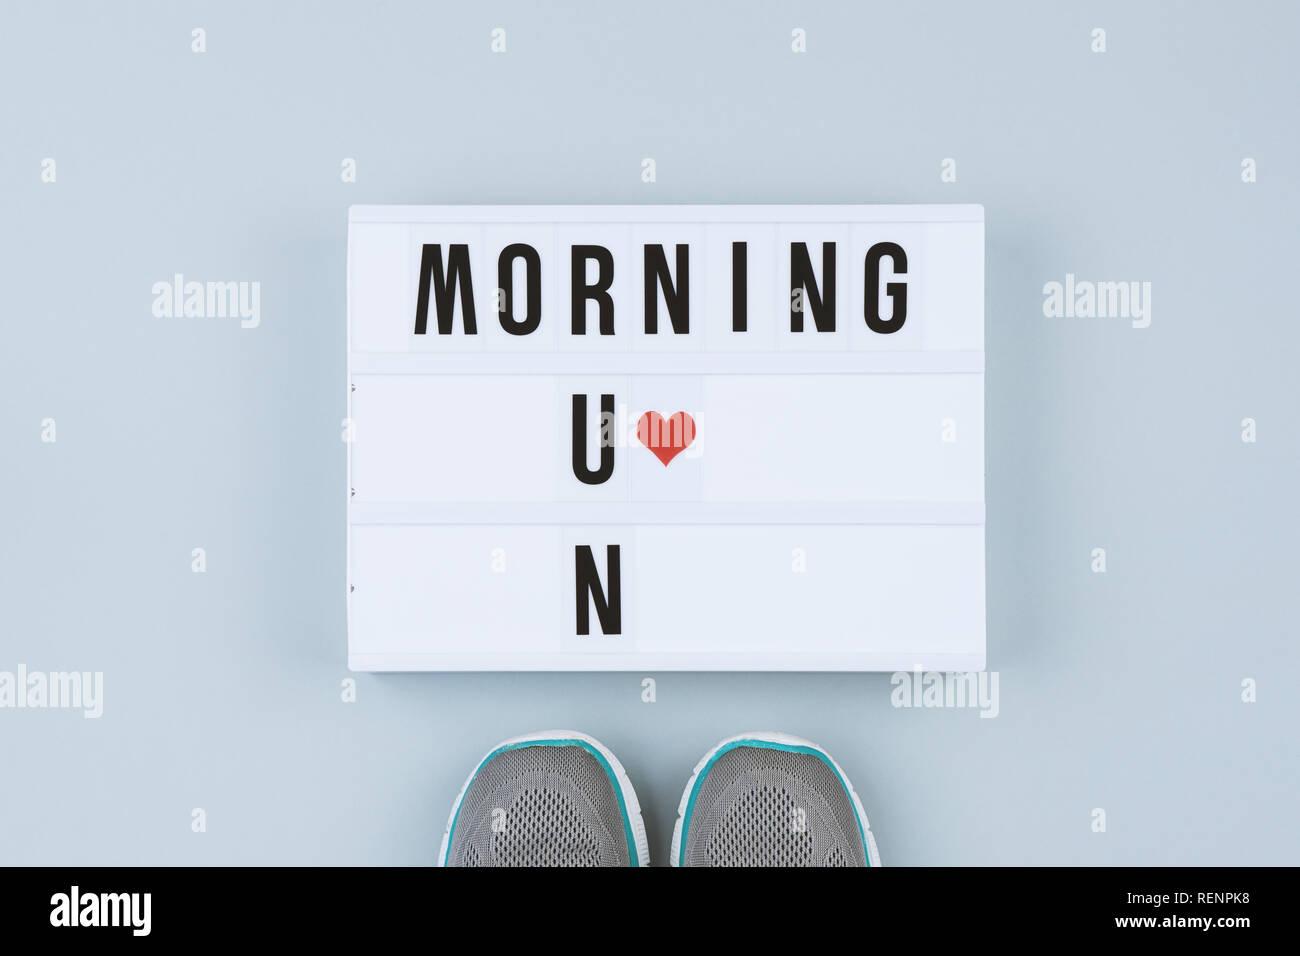 Texto de motivación en caja de luz mañana y zapatillas deportivas sobre  fondo gris fd5beae88ed29